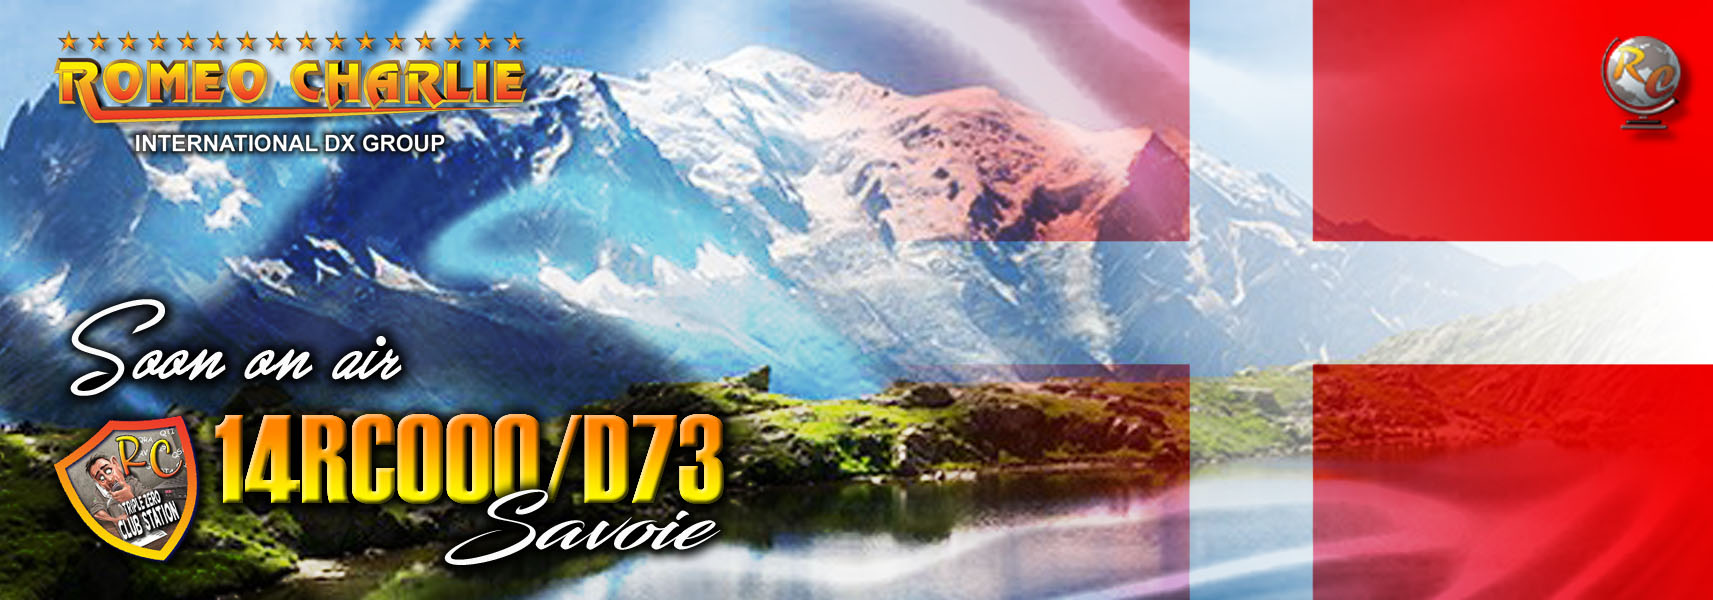 banner 14rc000d73